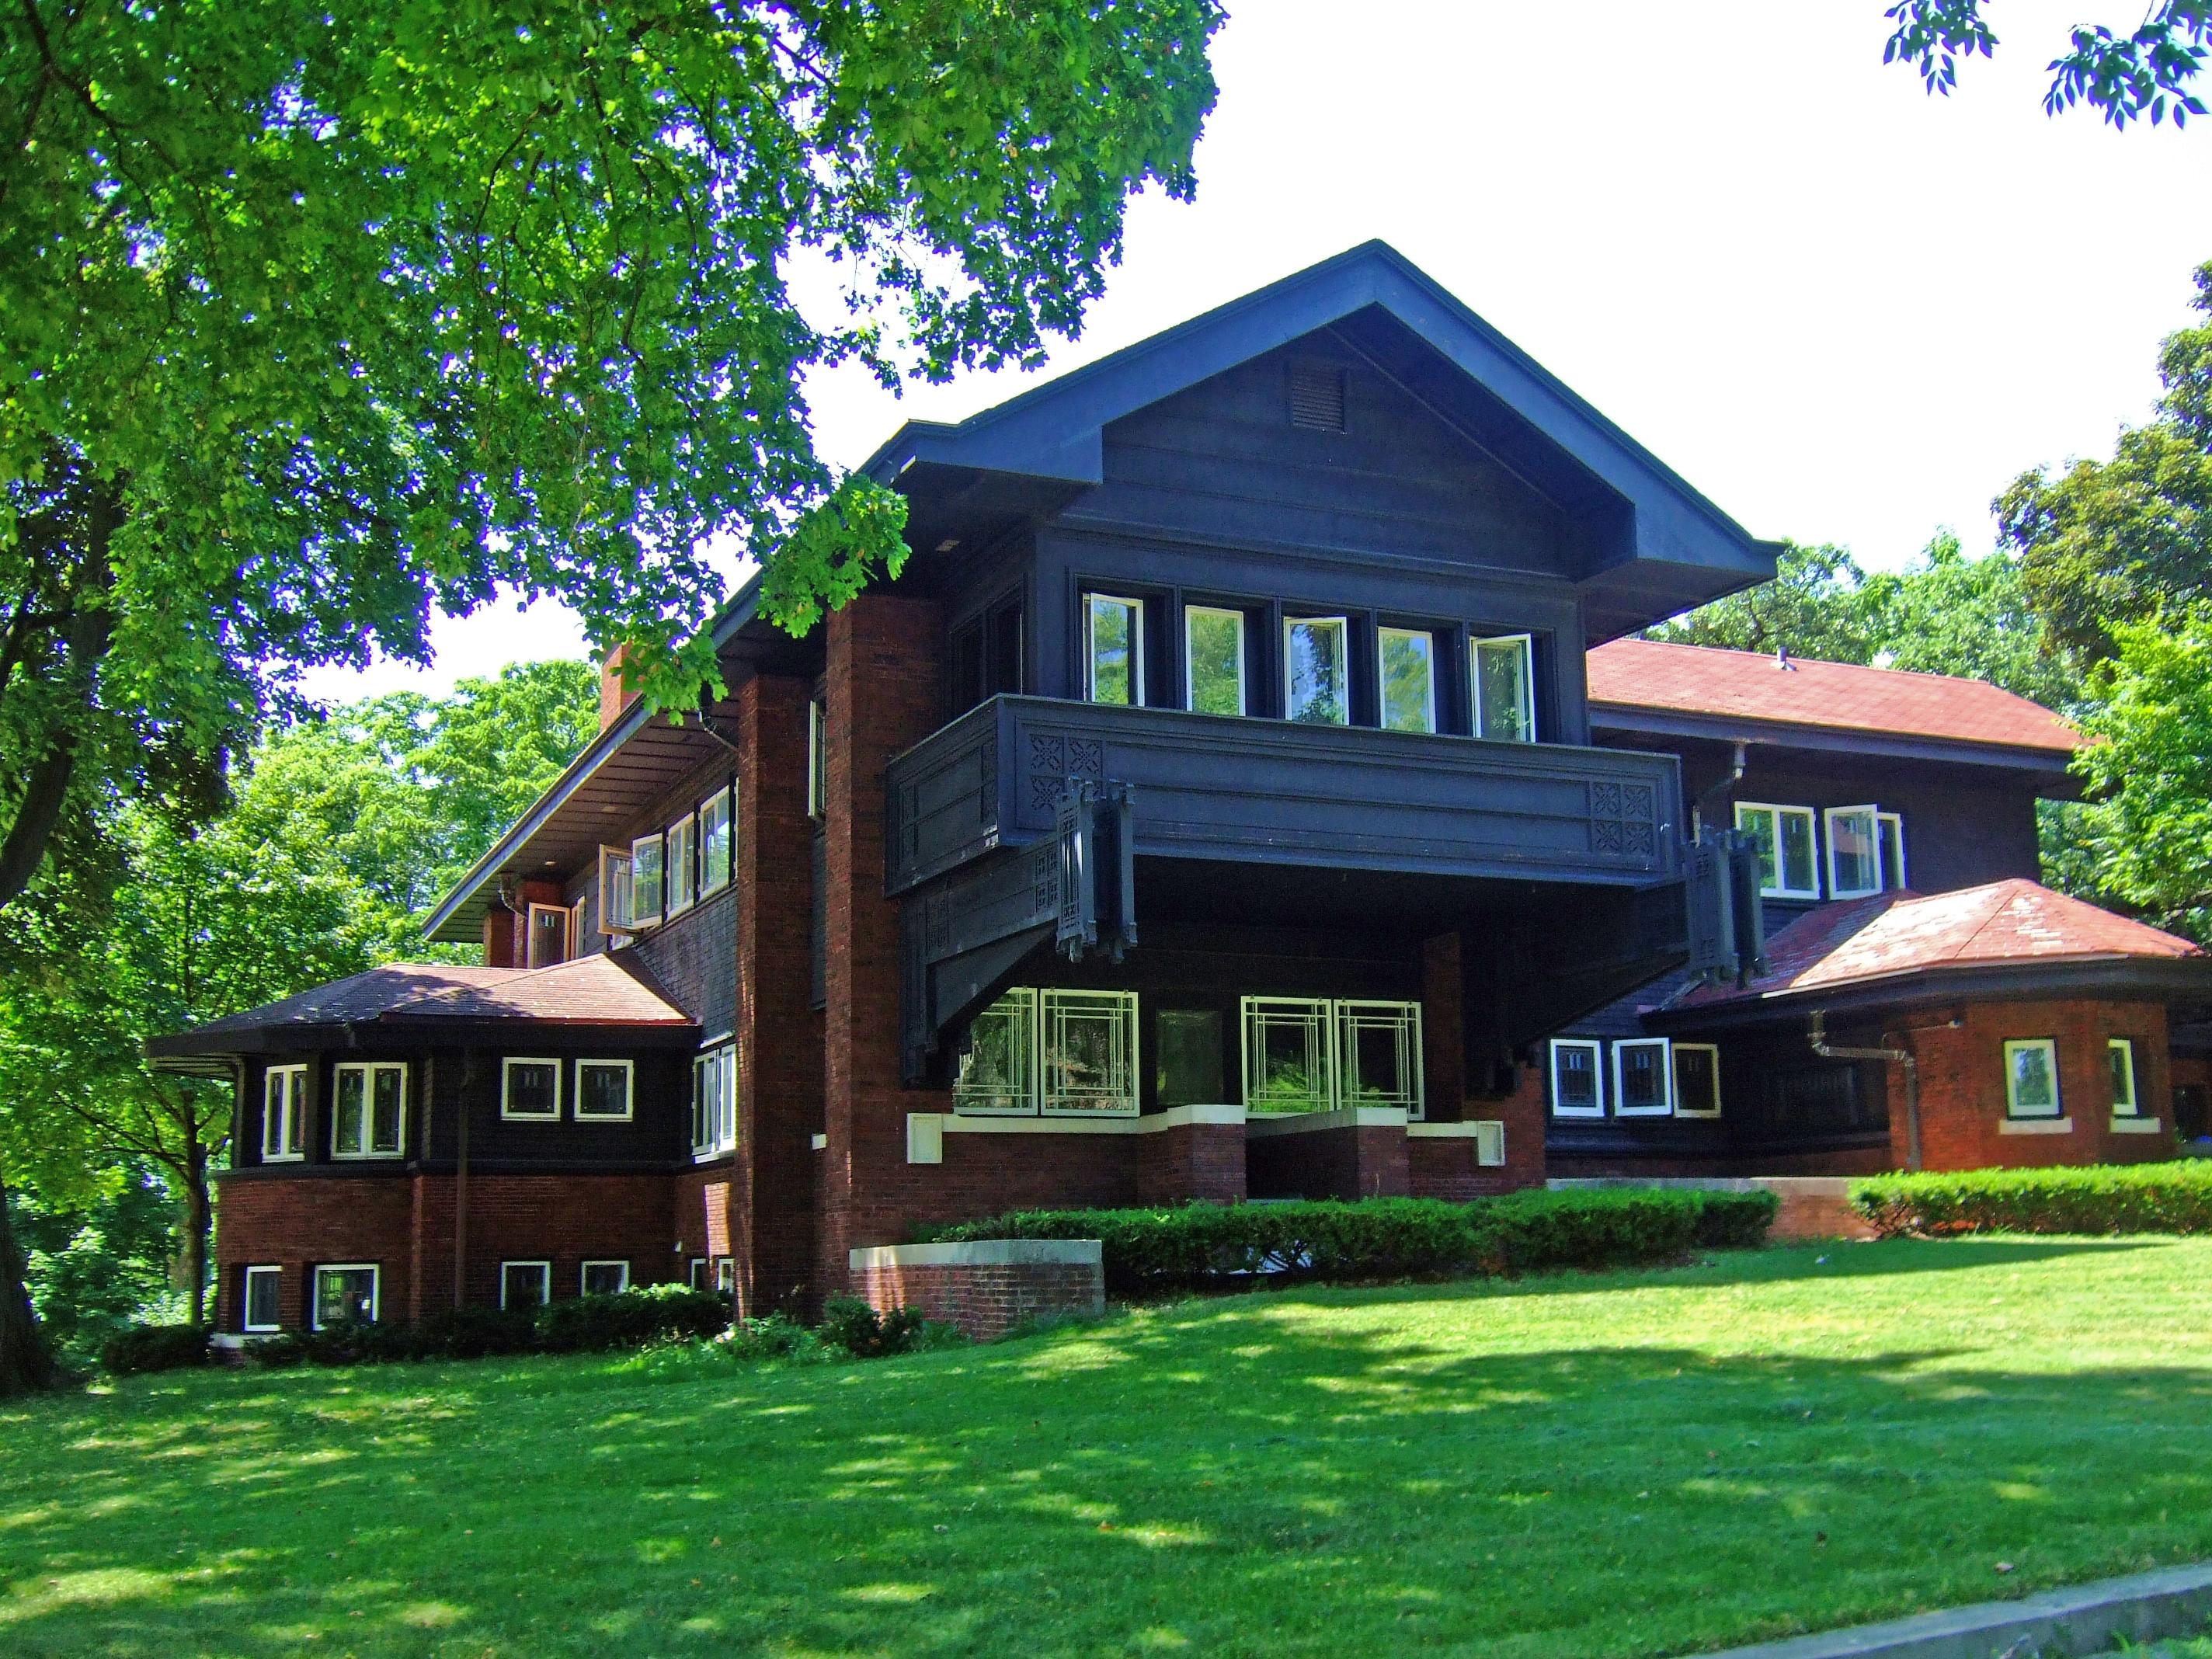 File:Bradley House Madison.jpg - Wikimedia Commons